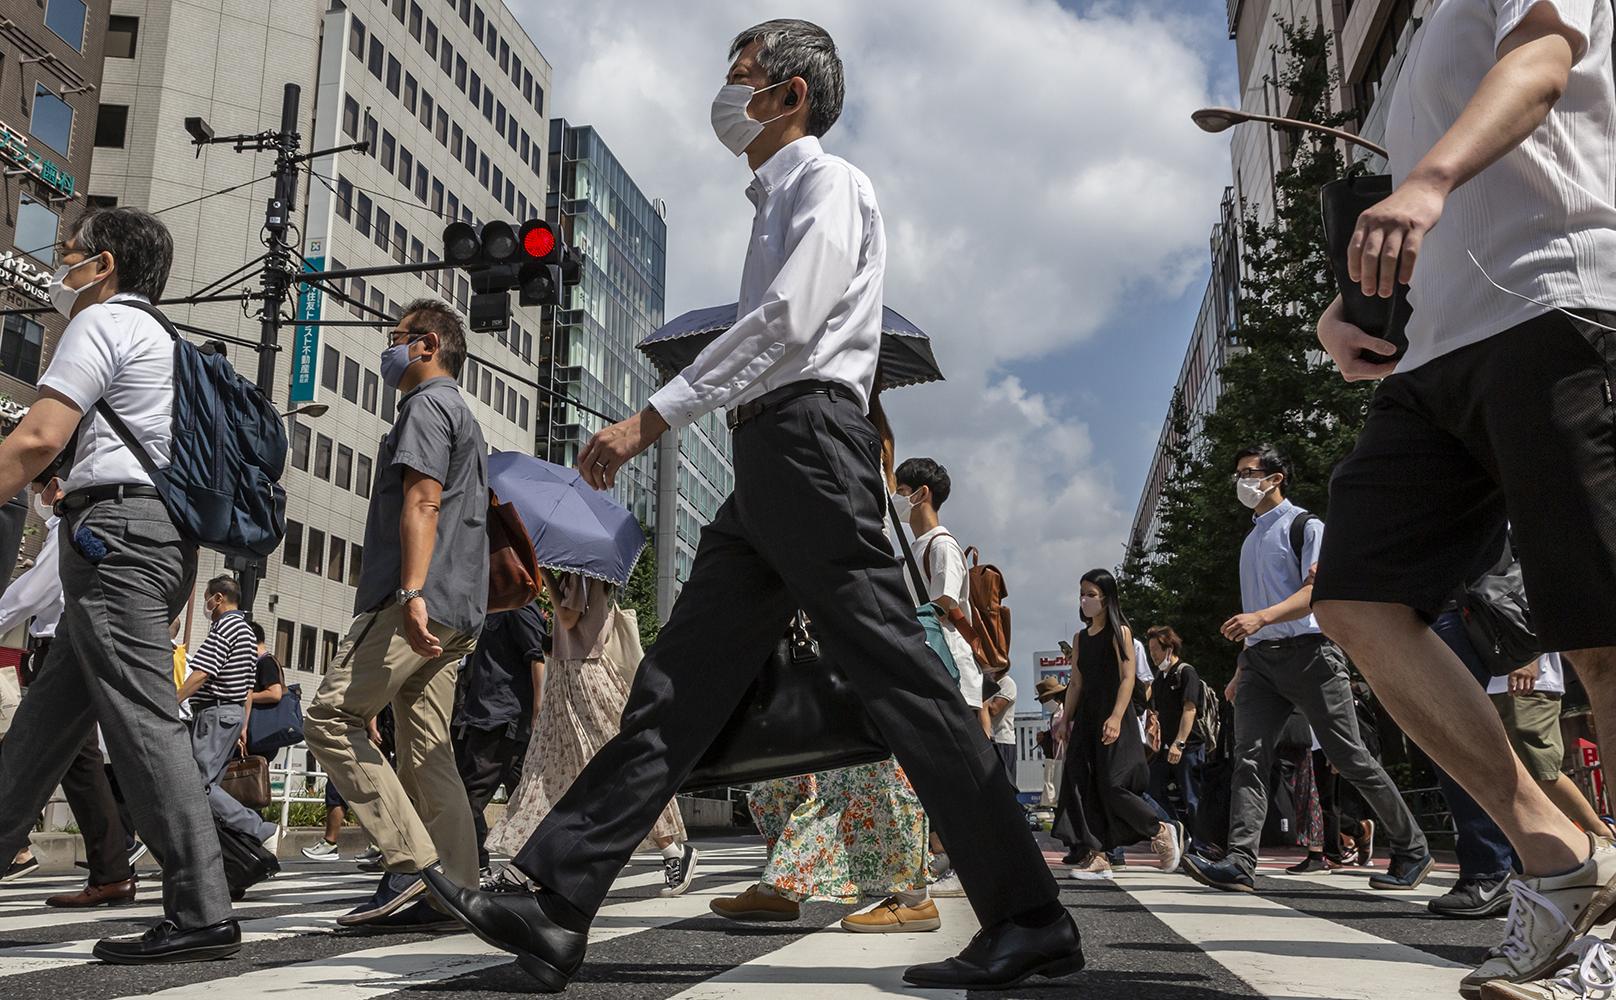 Фото: Yuichi Yamazaki / Getty Images